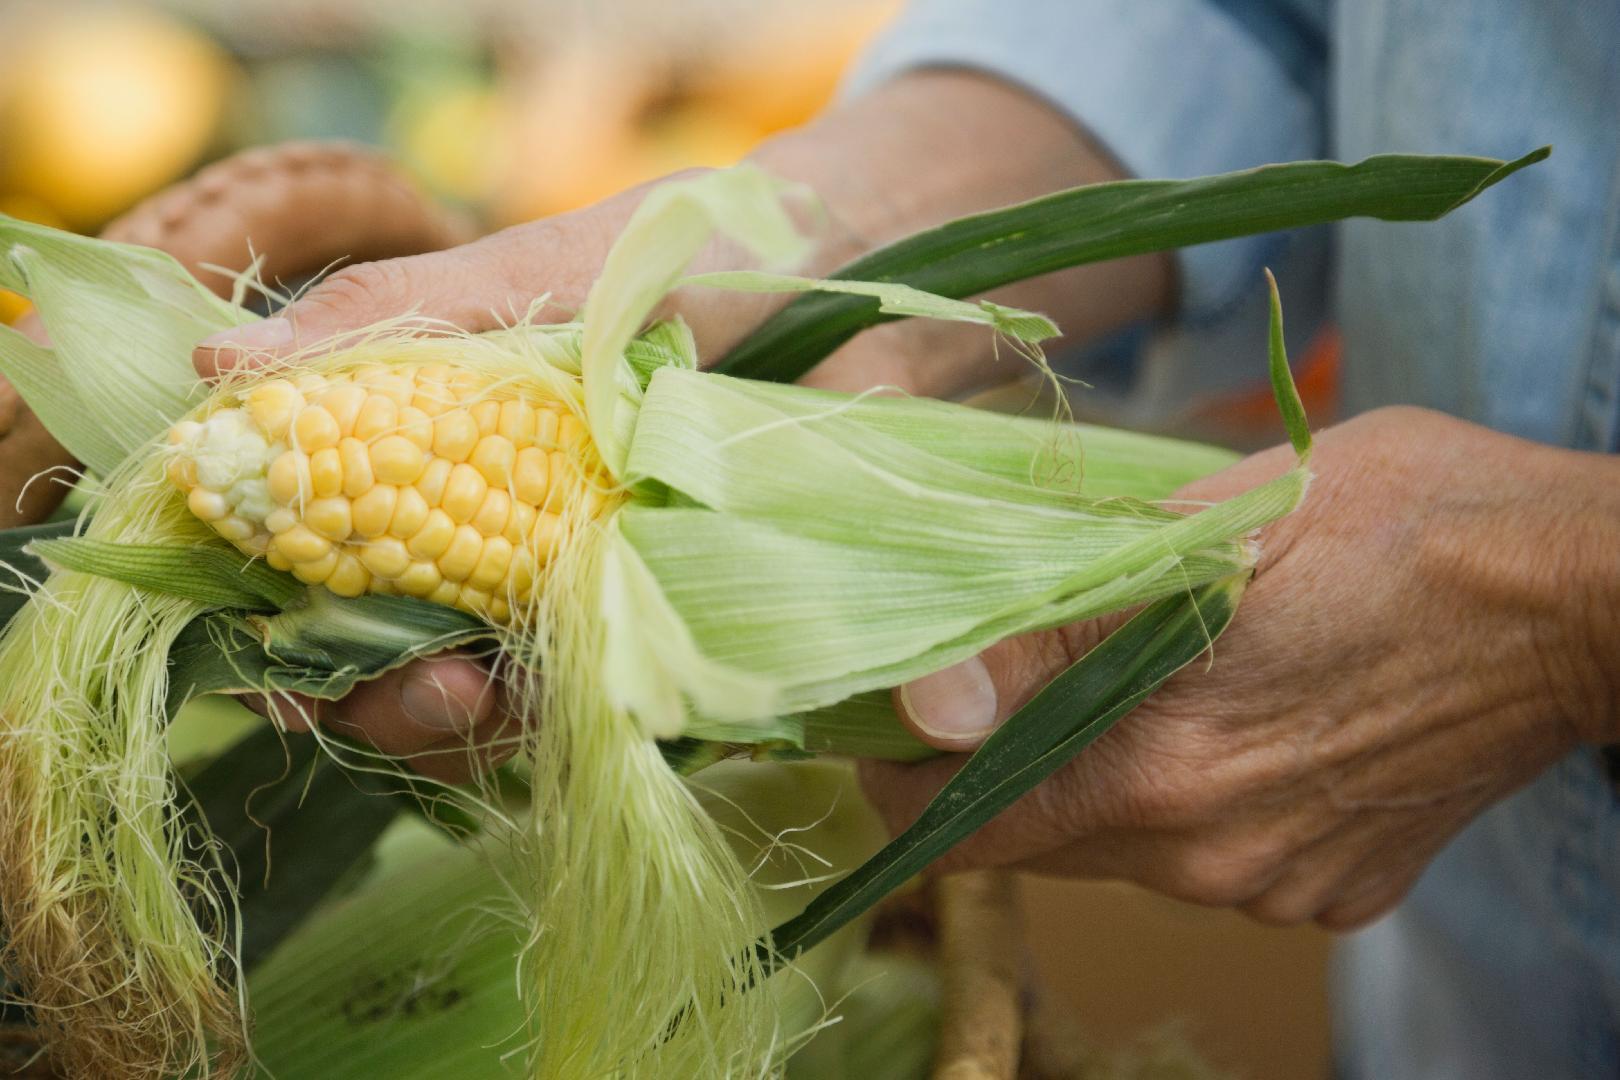 Three Easy Ways to Cook Corn on the Cob